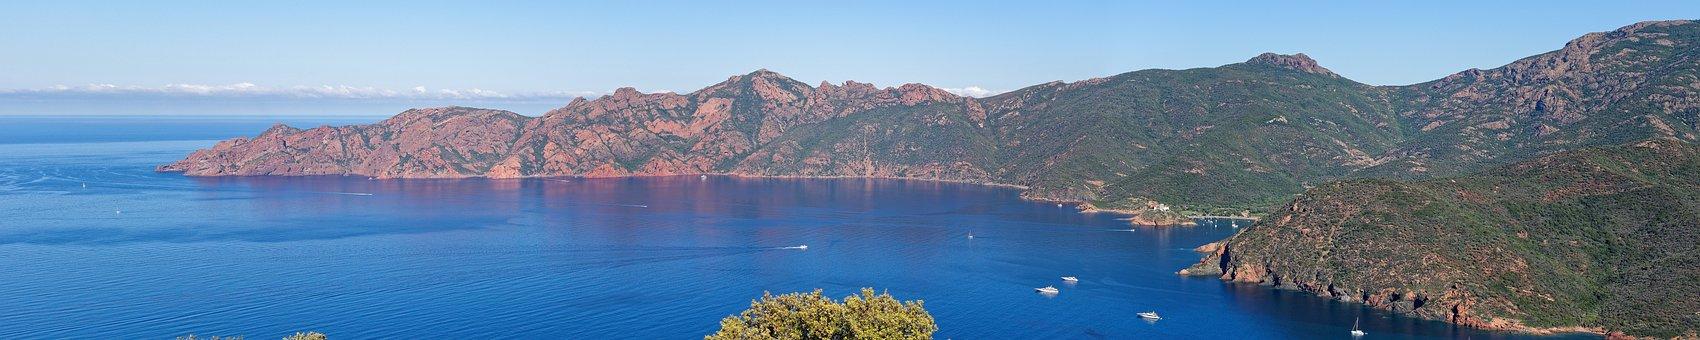 Panoramic Image, Corsica, France, Panorama, Landscape